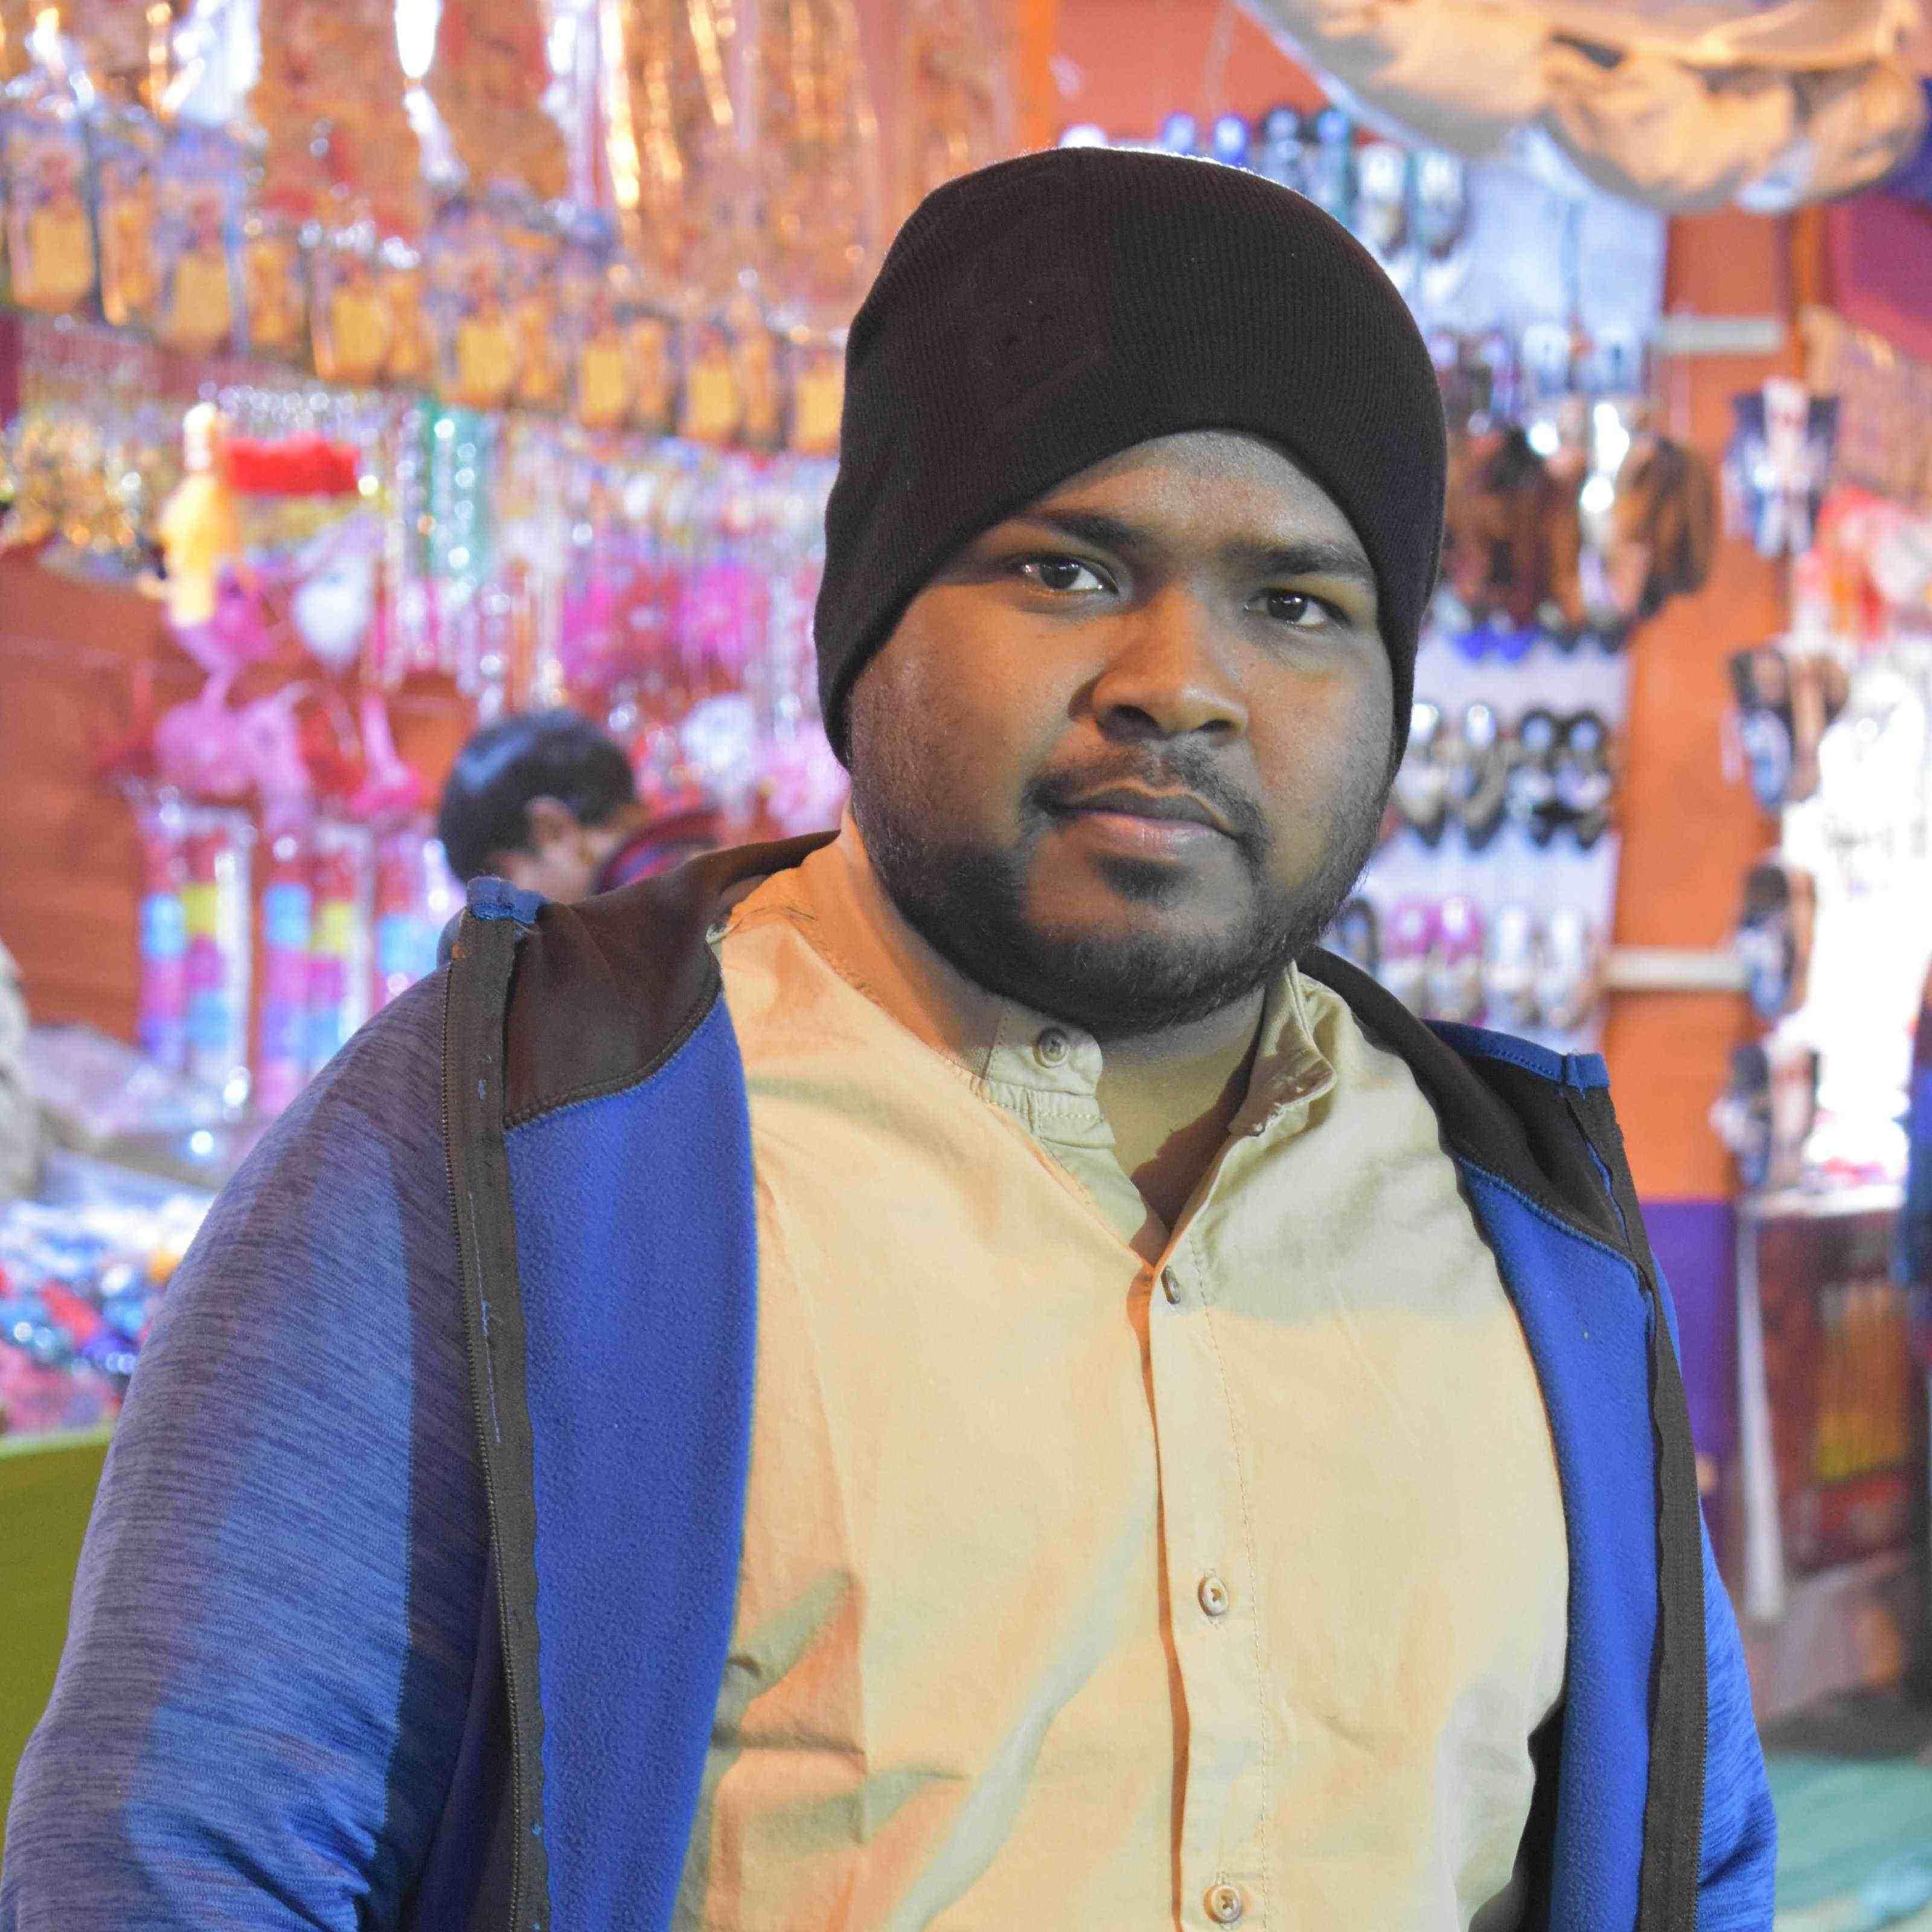 Ravi Ranjan Home City- Patna, Engineer, UPSC Aspirant, Scribbler